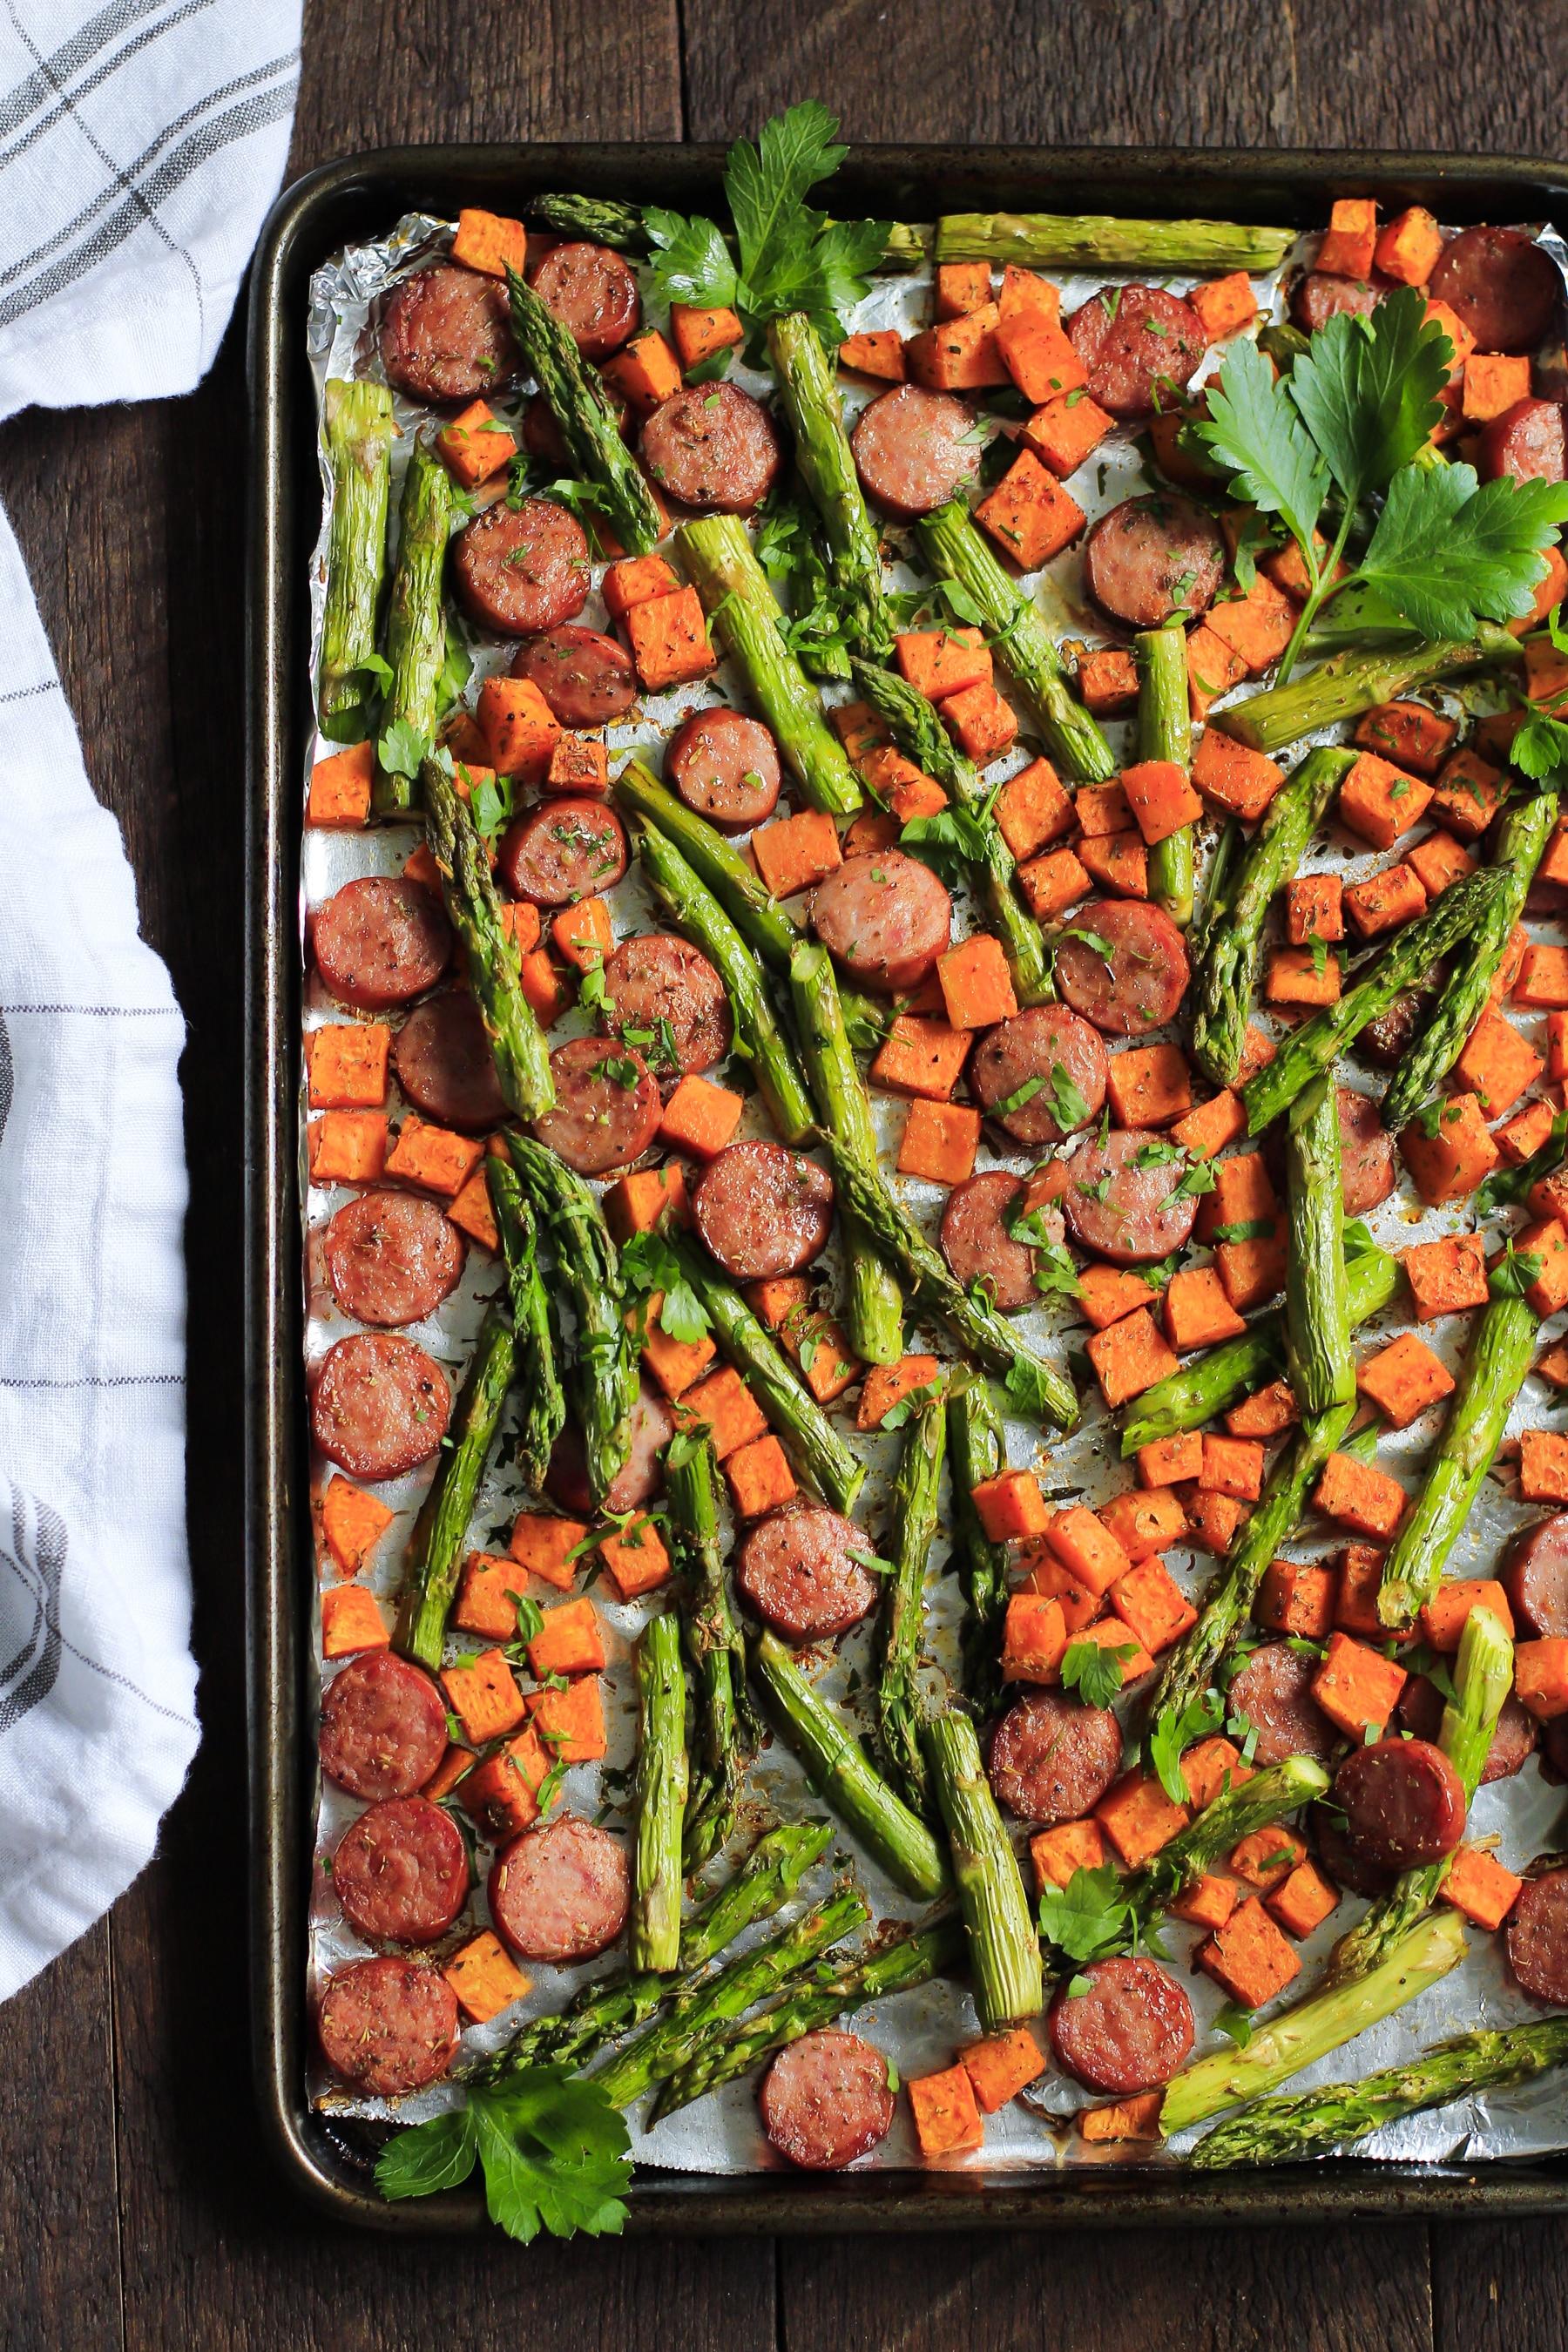 Sheet pan with sausage, asparagus, and sweet potatoes